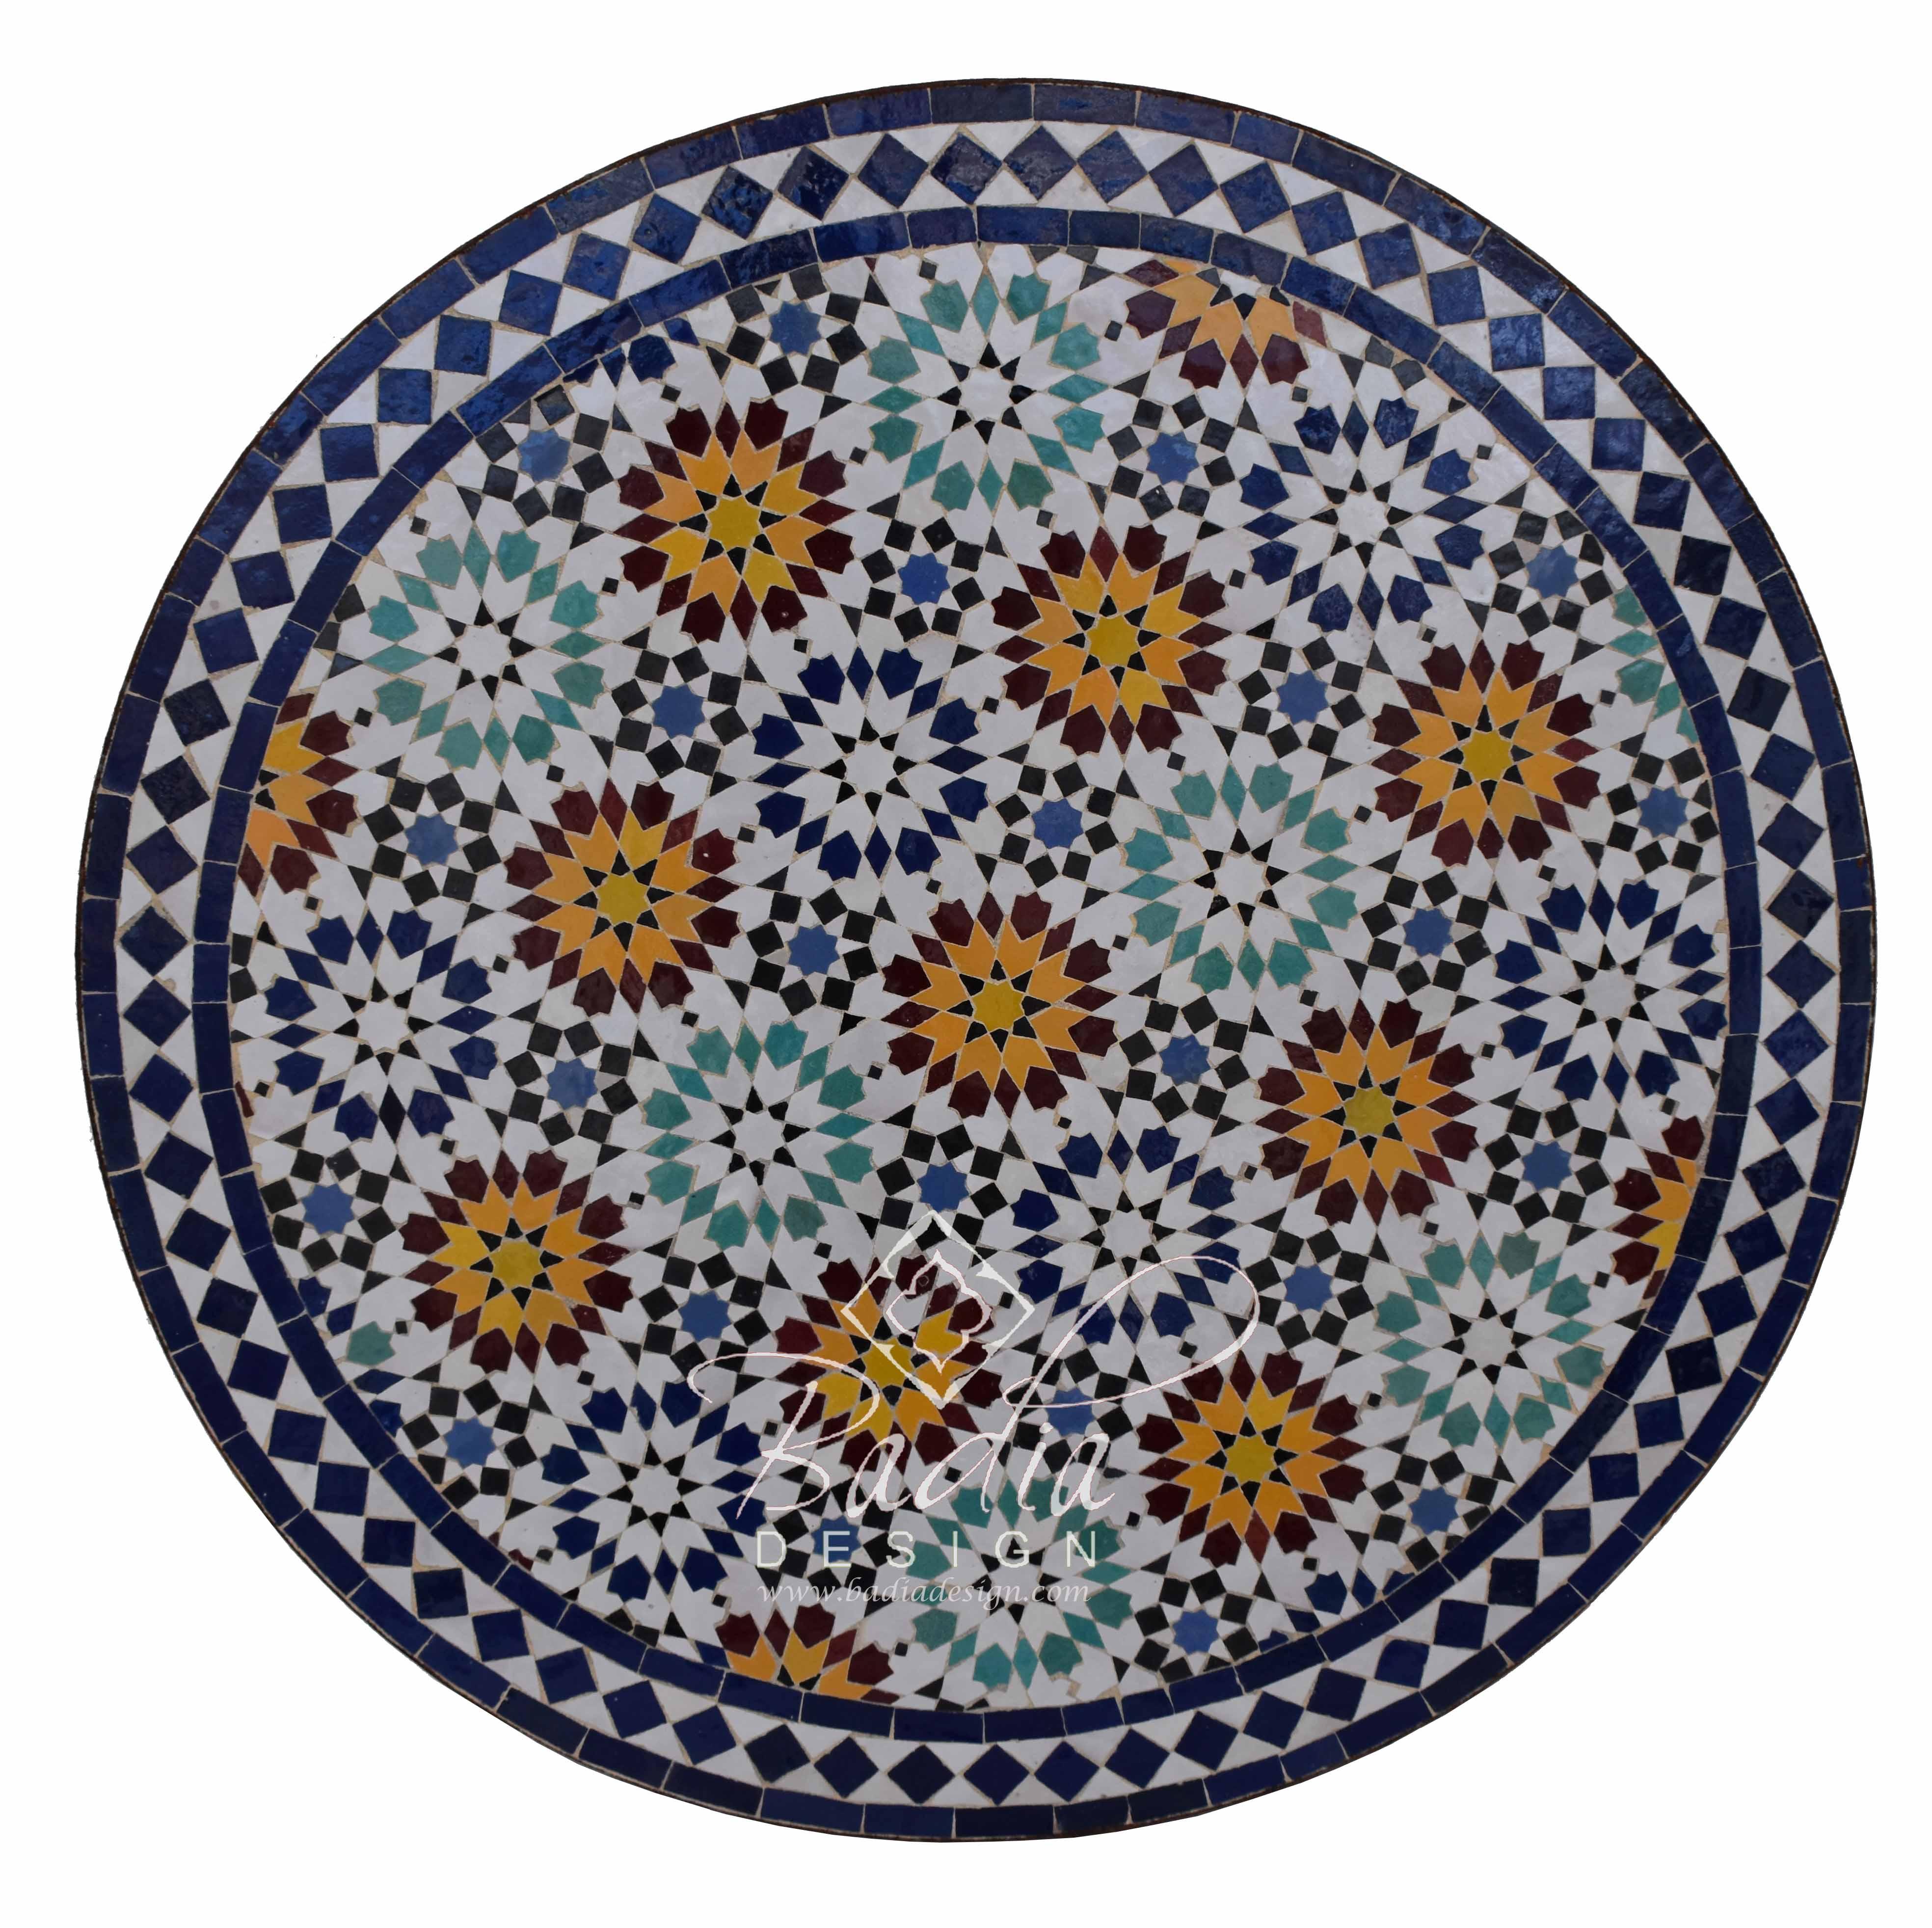 moroccan-tile-table-tops-los-angeles-mtr274.jpg